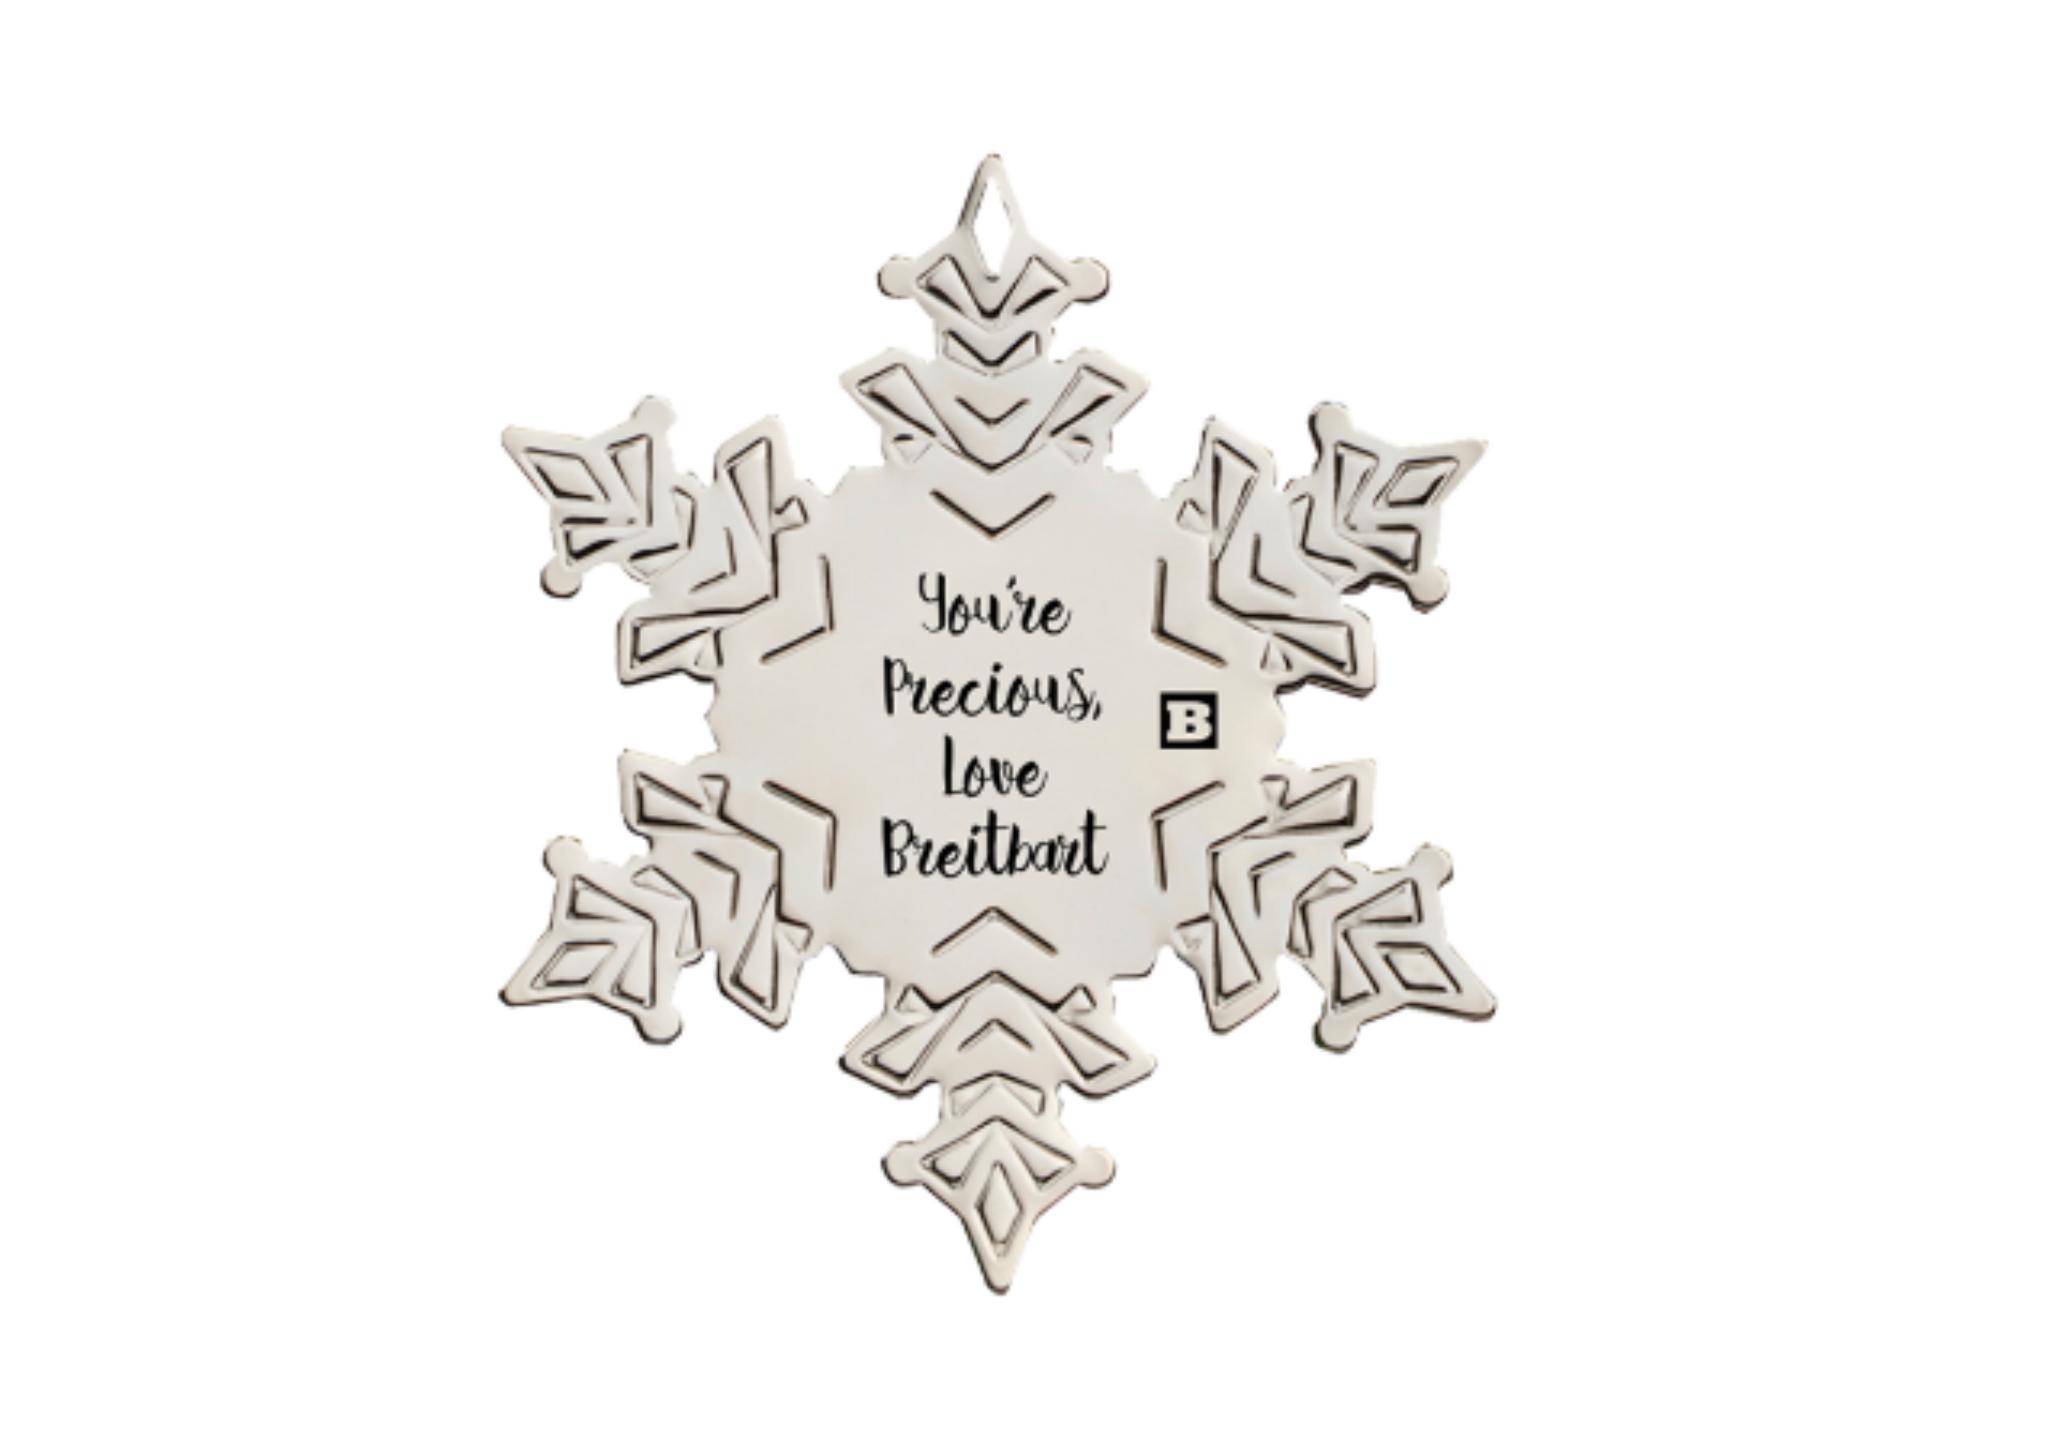 Breitbart Sells Precious Snowflake Tree Decoration To Troll